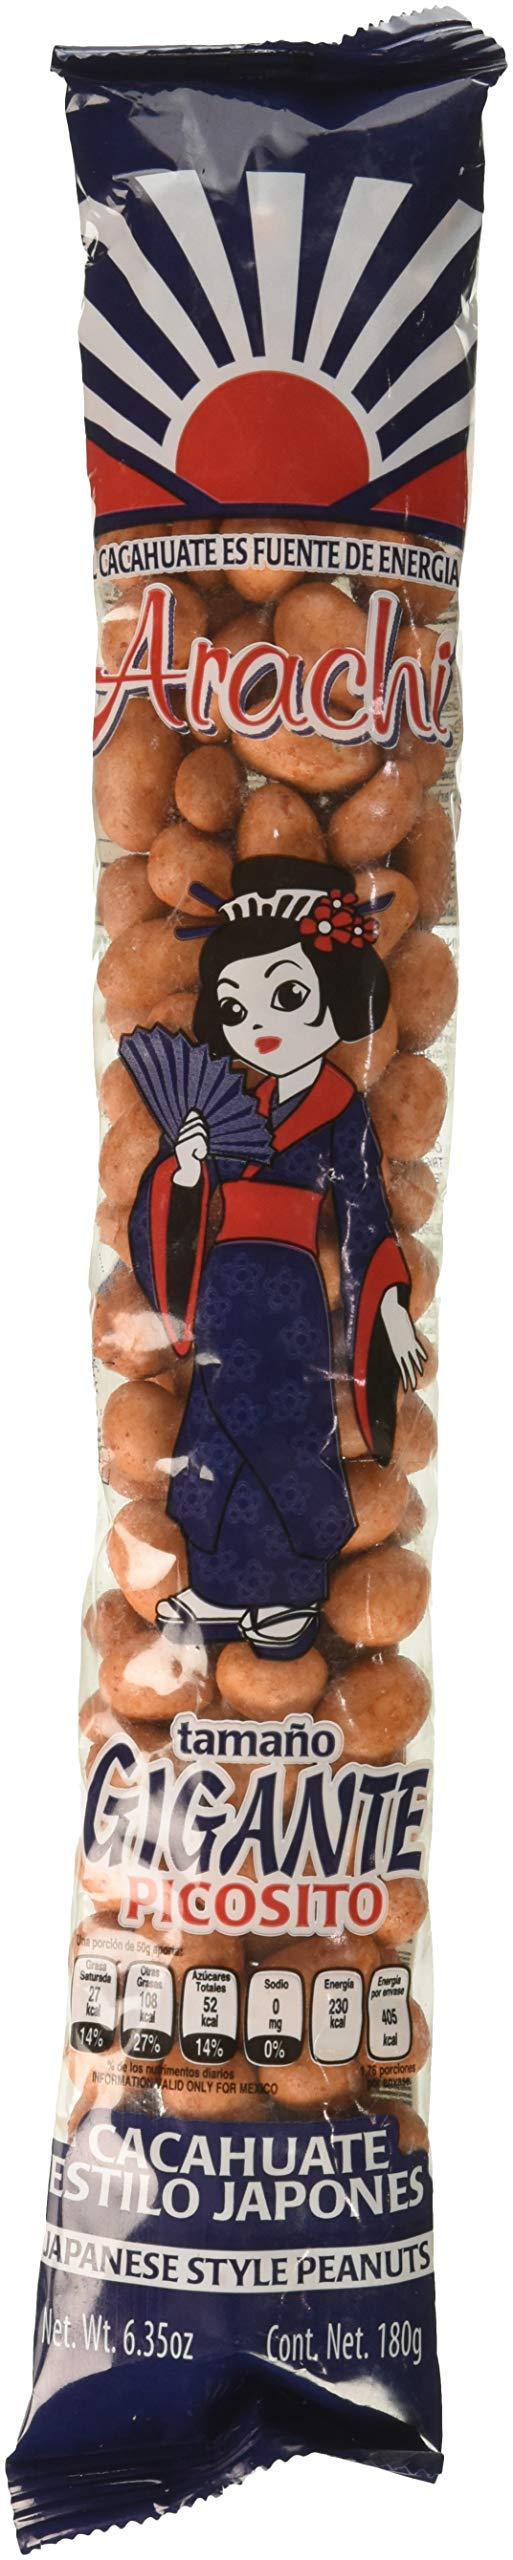 Arachi Picosito Japanese Cocktail Style Peanuts (Cacahuate Estilo Japones) 10-pcs 3-